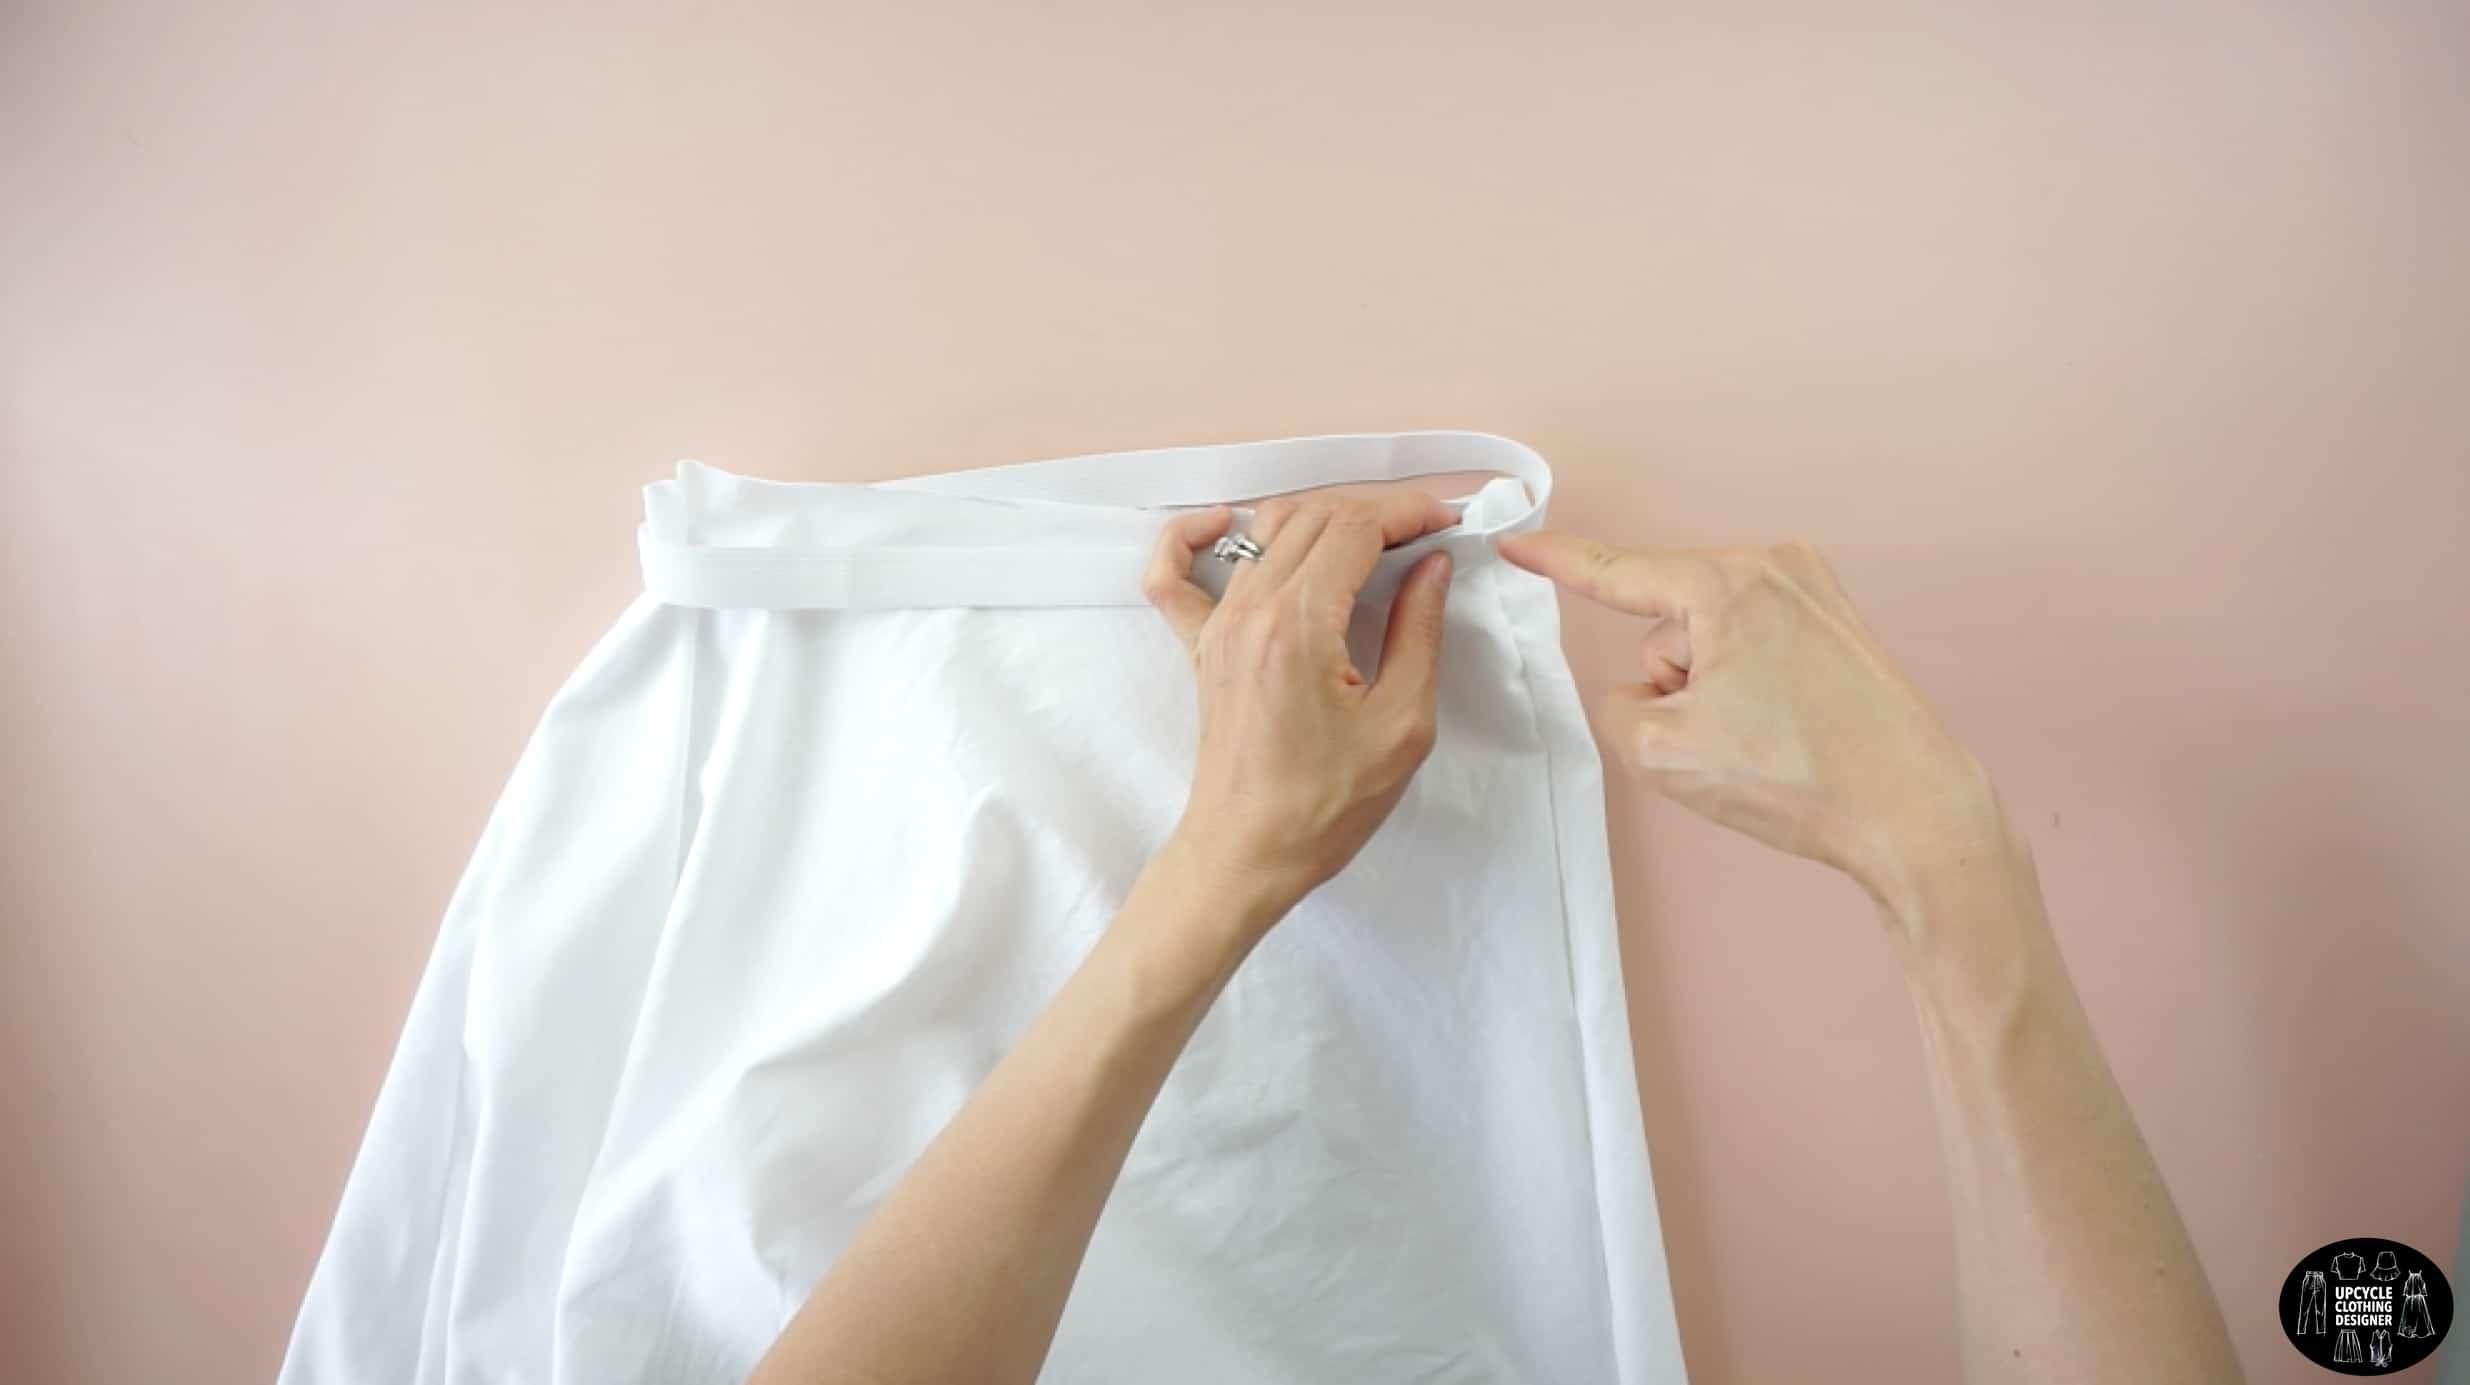 Pin the elastic band to the waistline of the mini skirt